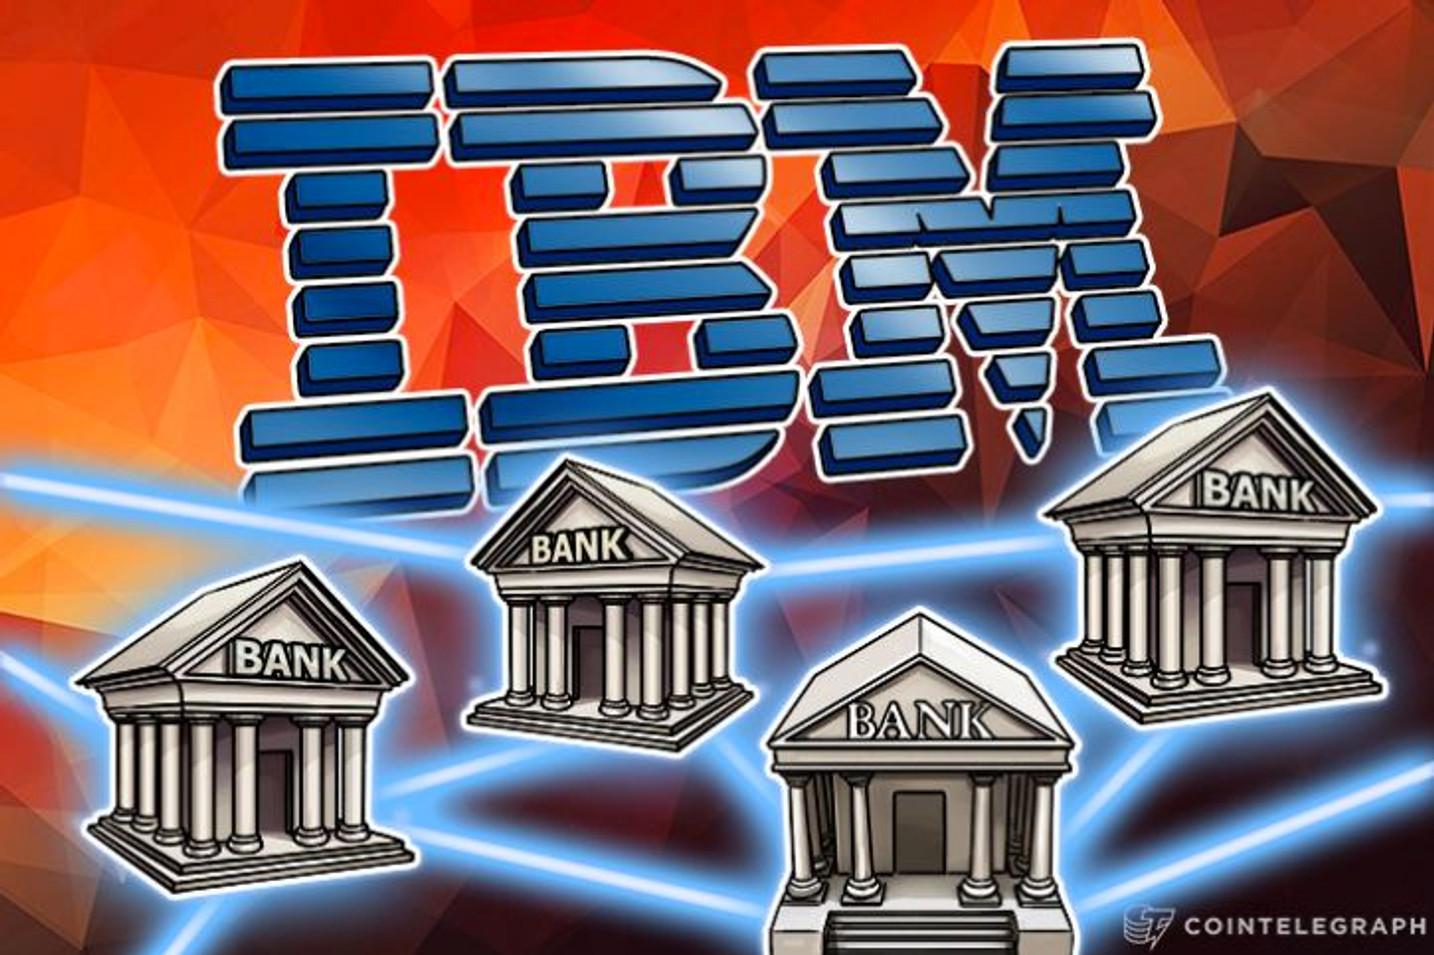 IBM Blockchain Goes Live at Las Vegas Interconnect